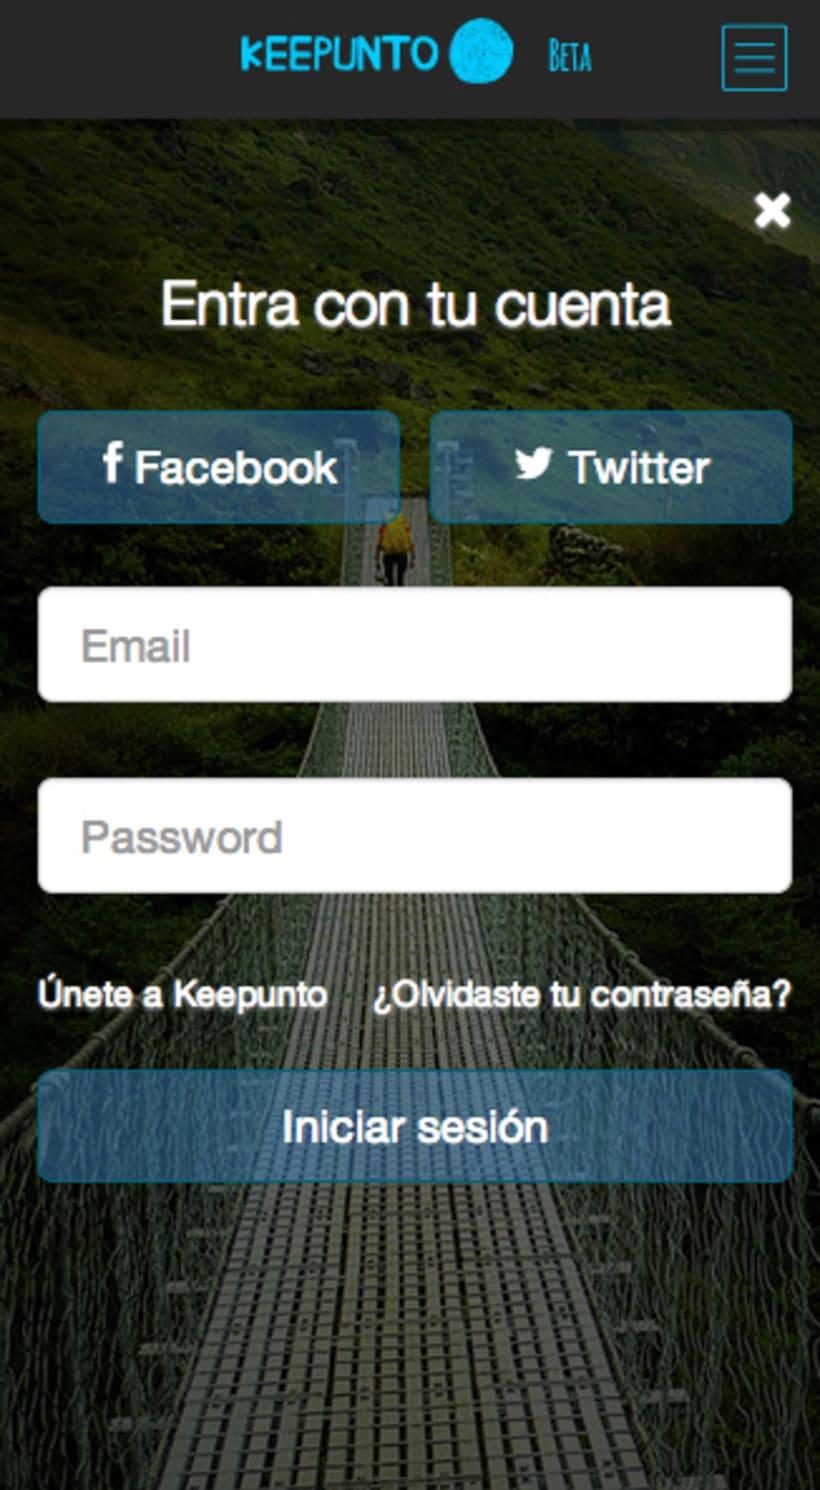 Keepunto Diseño Movil (web mobile) 4